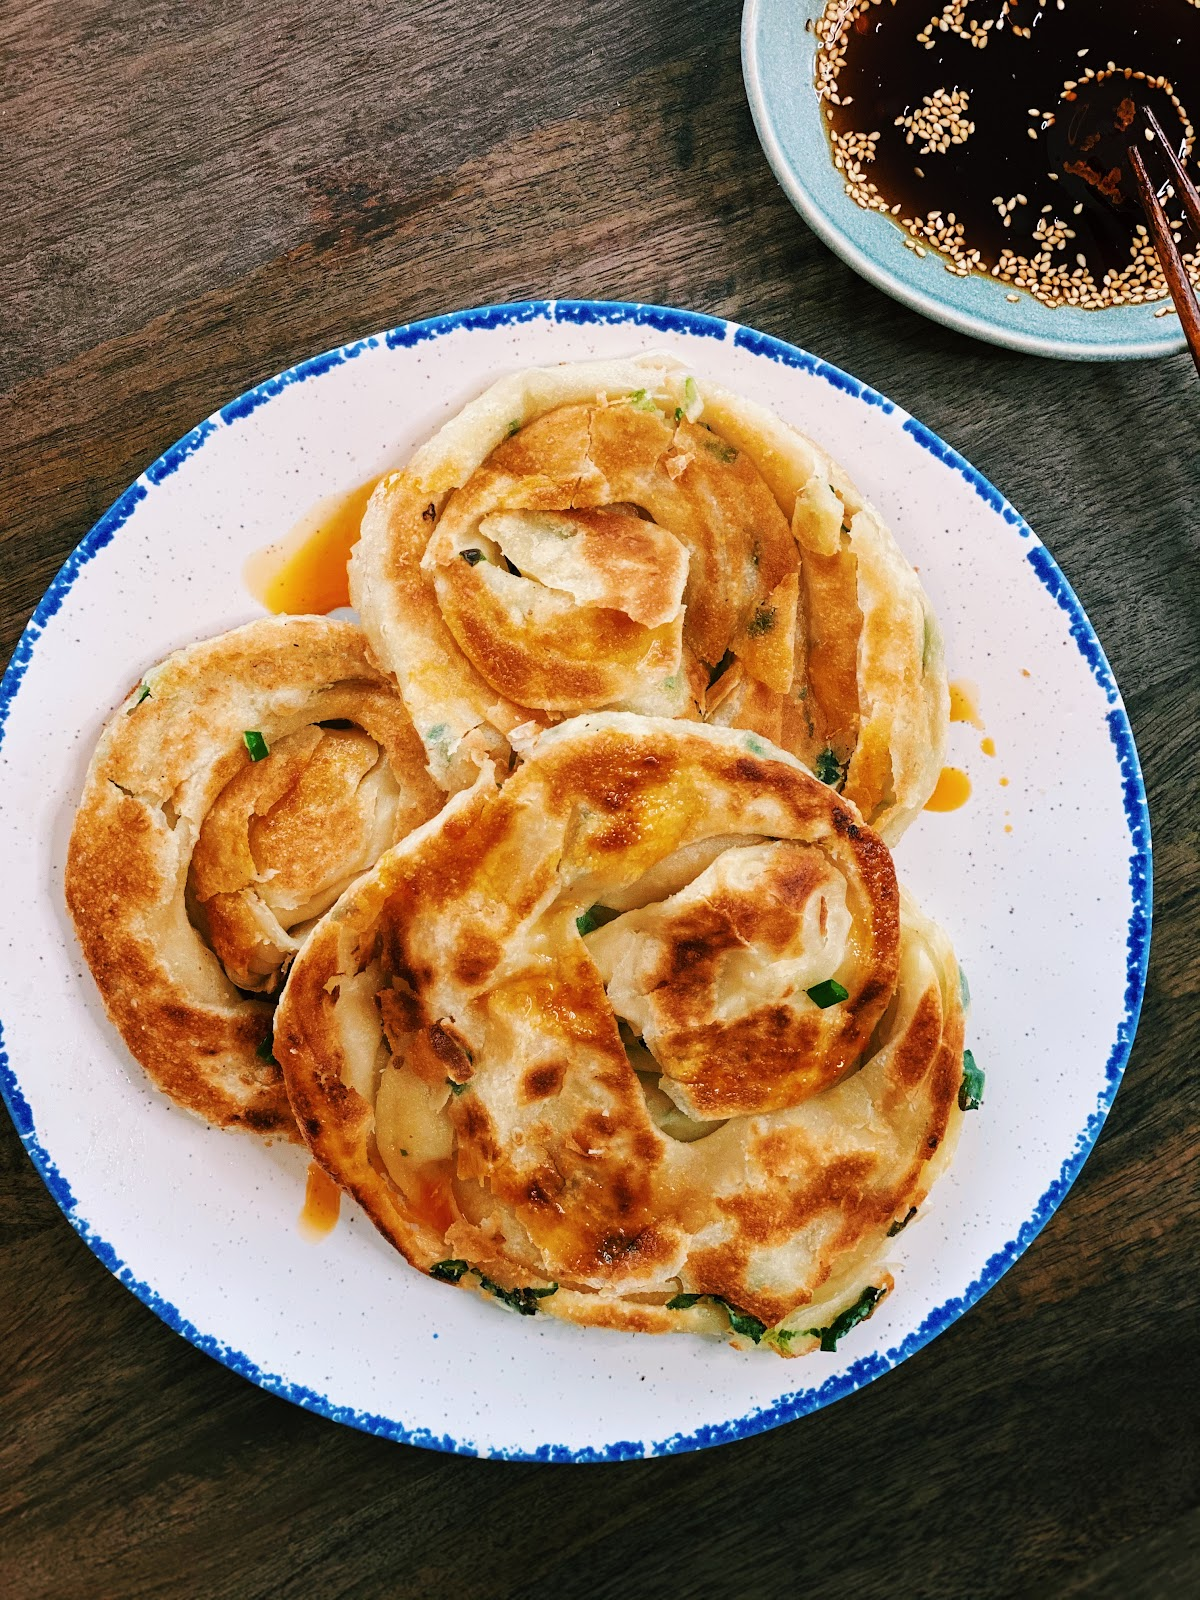 Extra Crispy & Flakey Green Onion Pancake